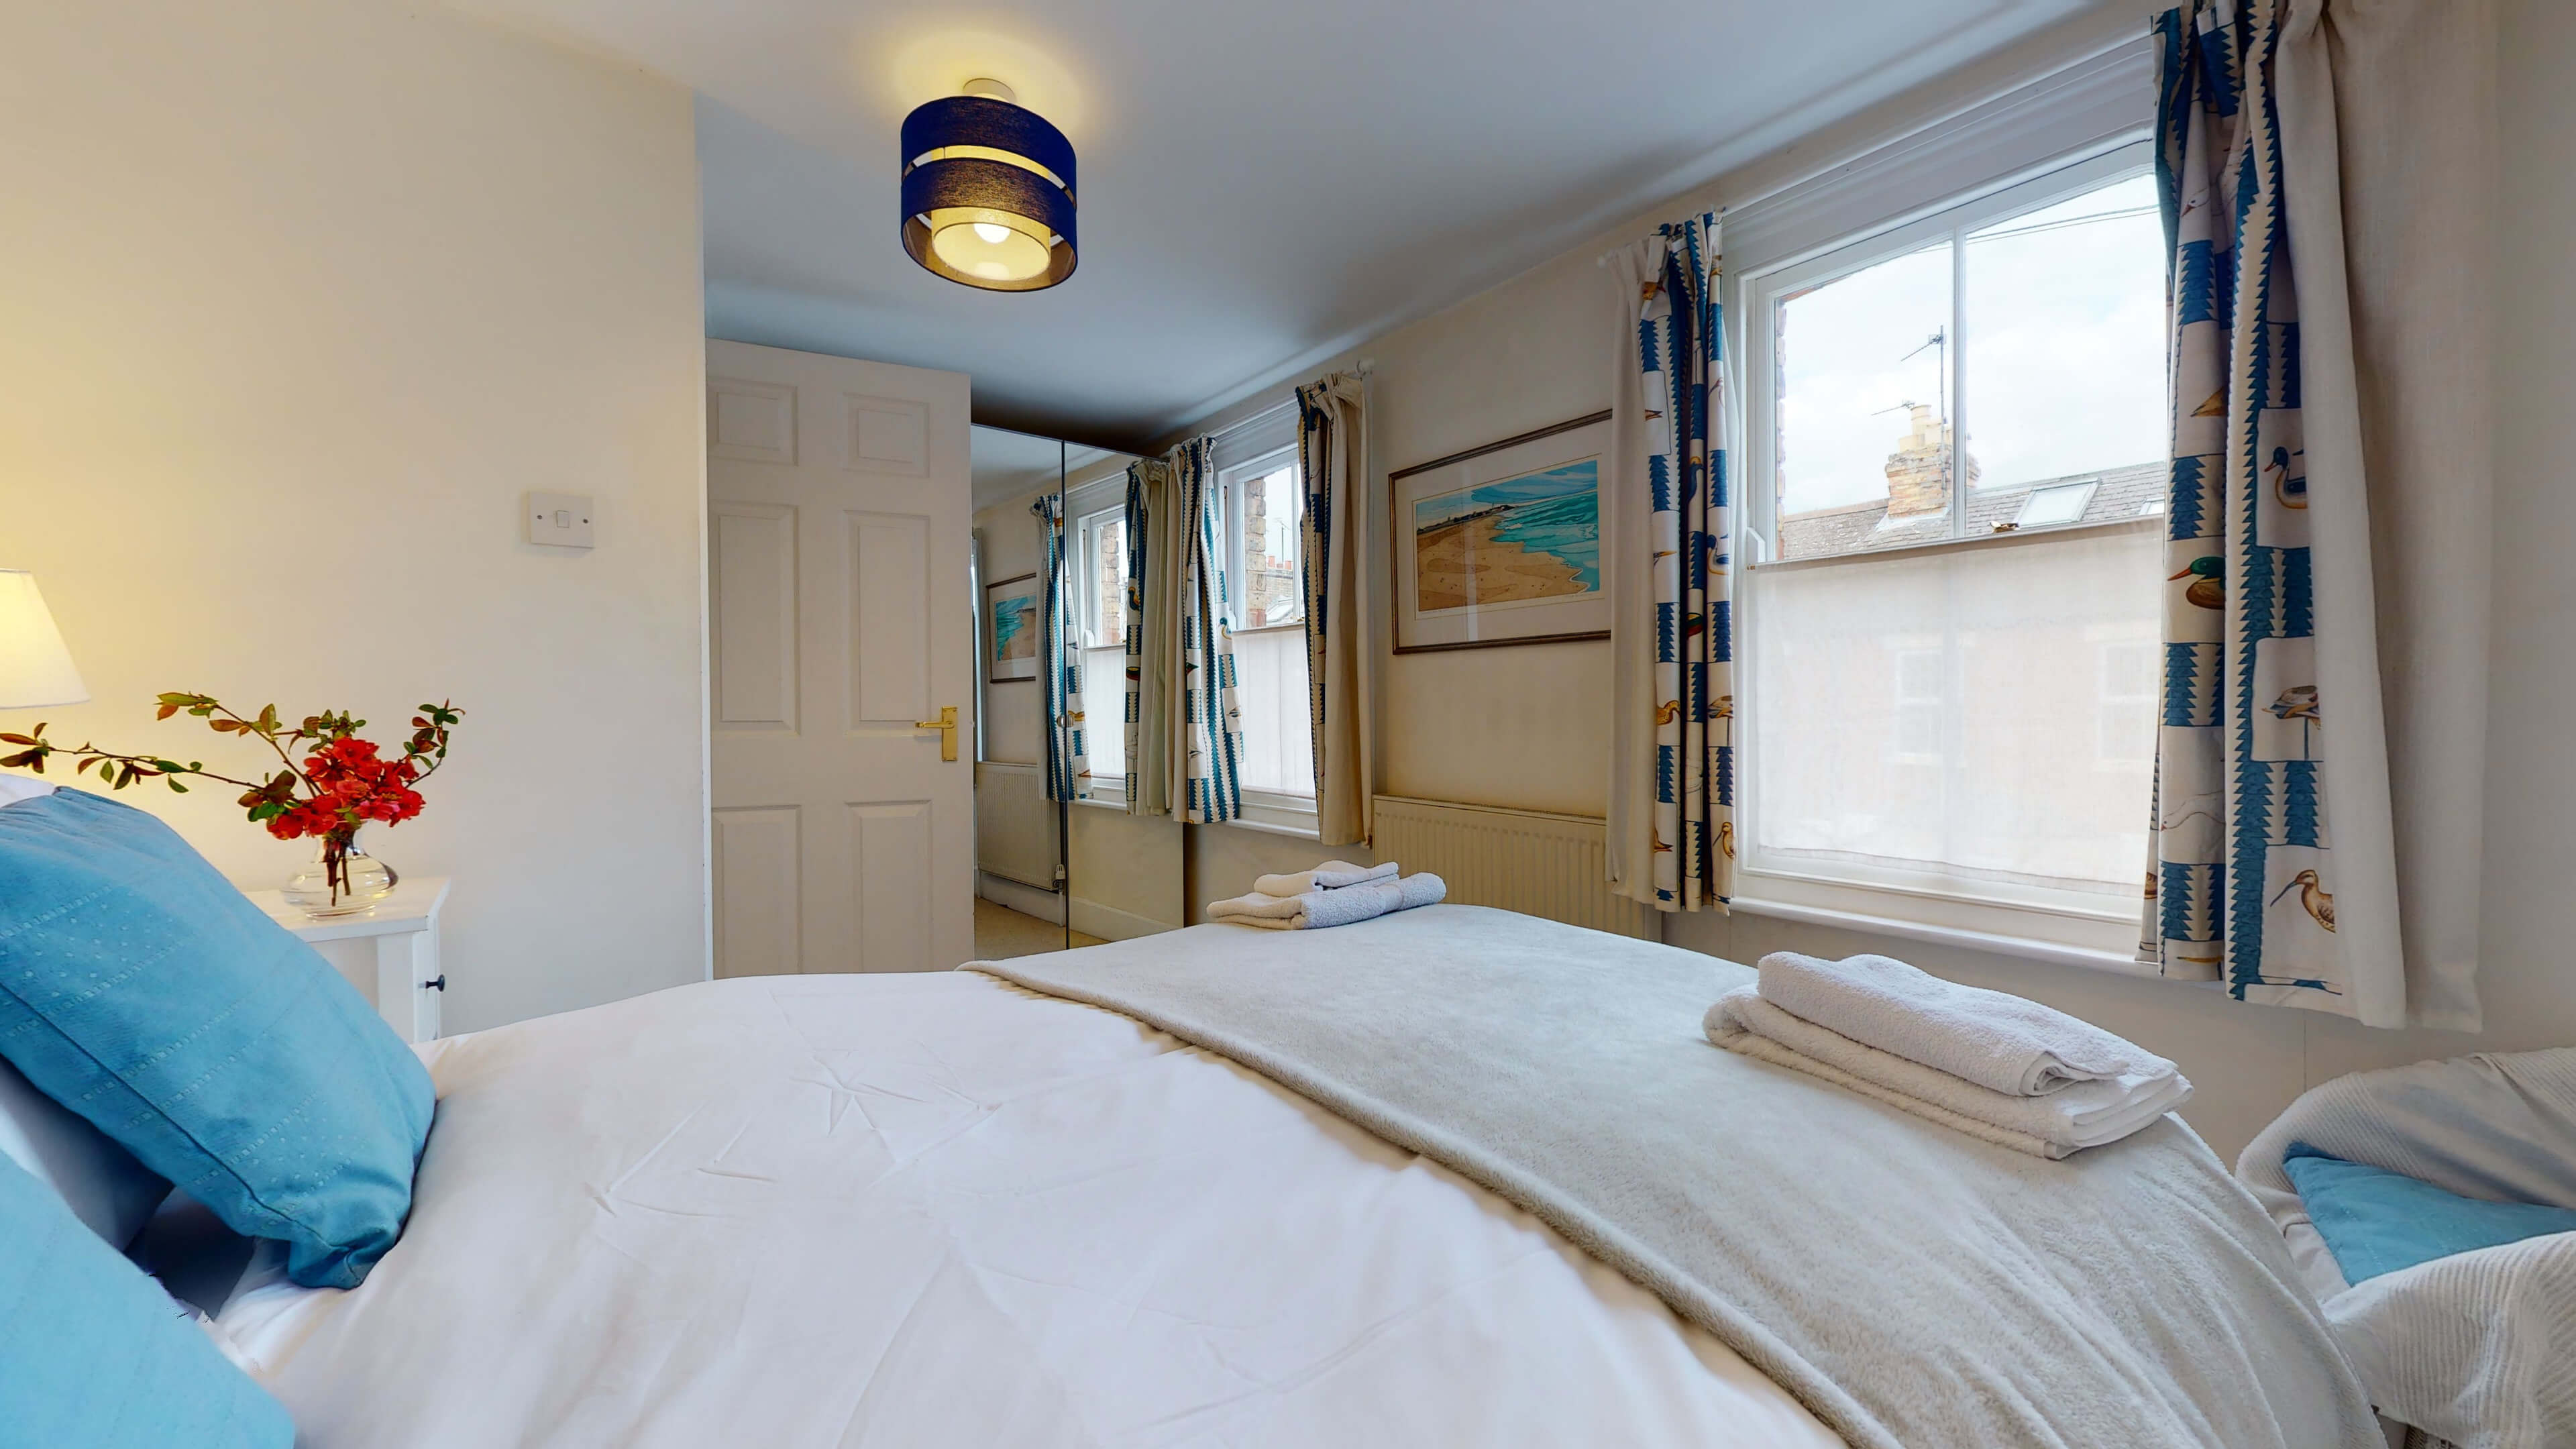 Marlborough Road Marlborough Road Bedroom1